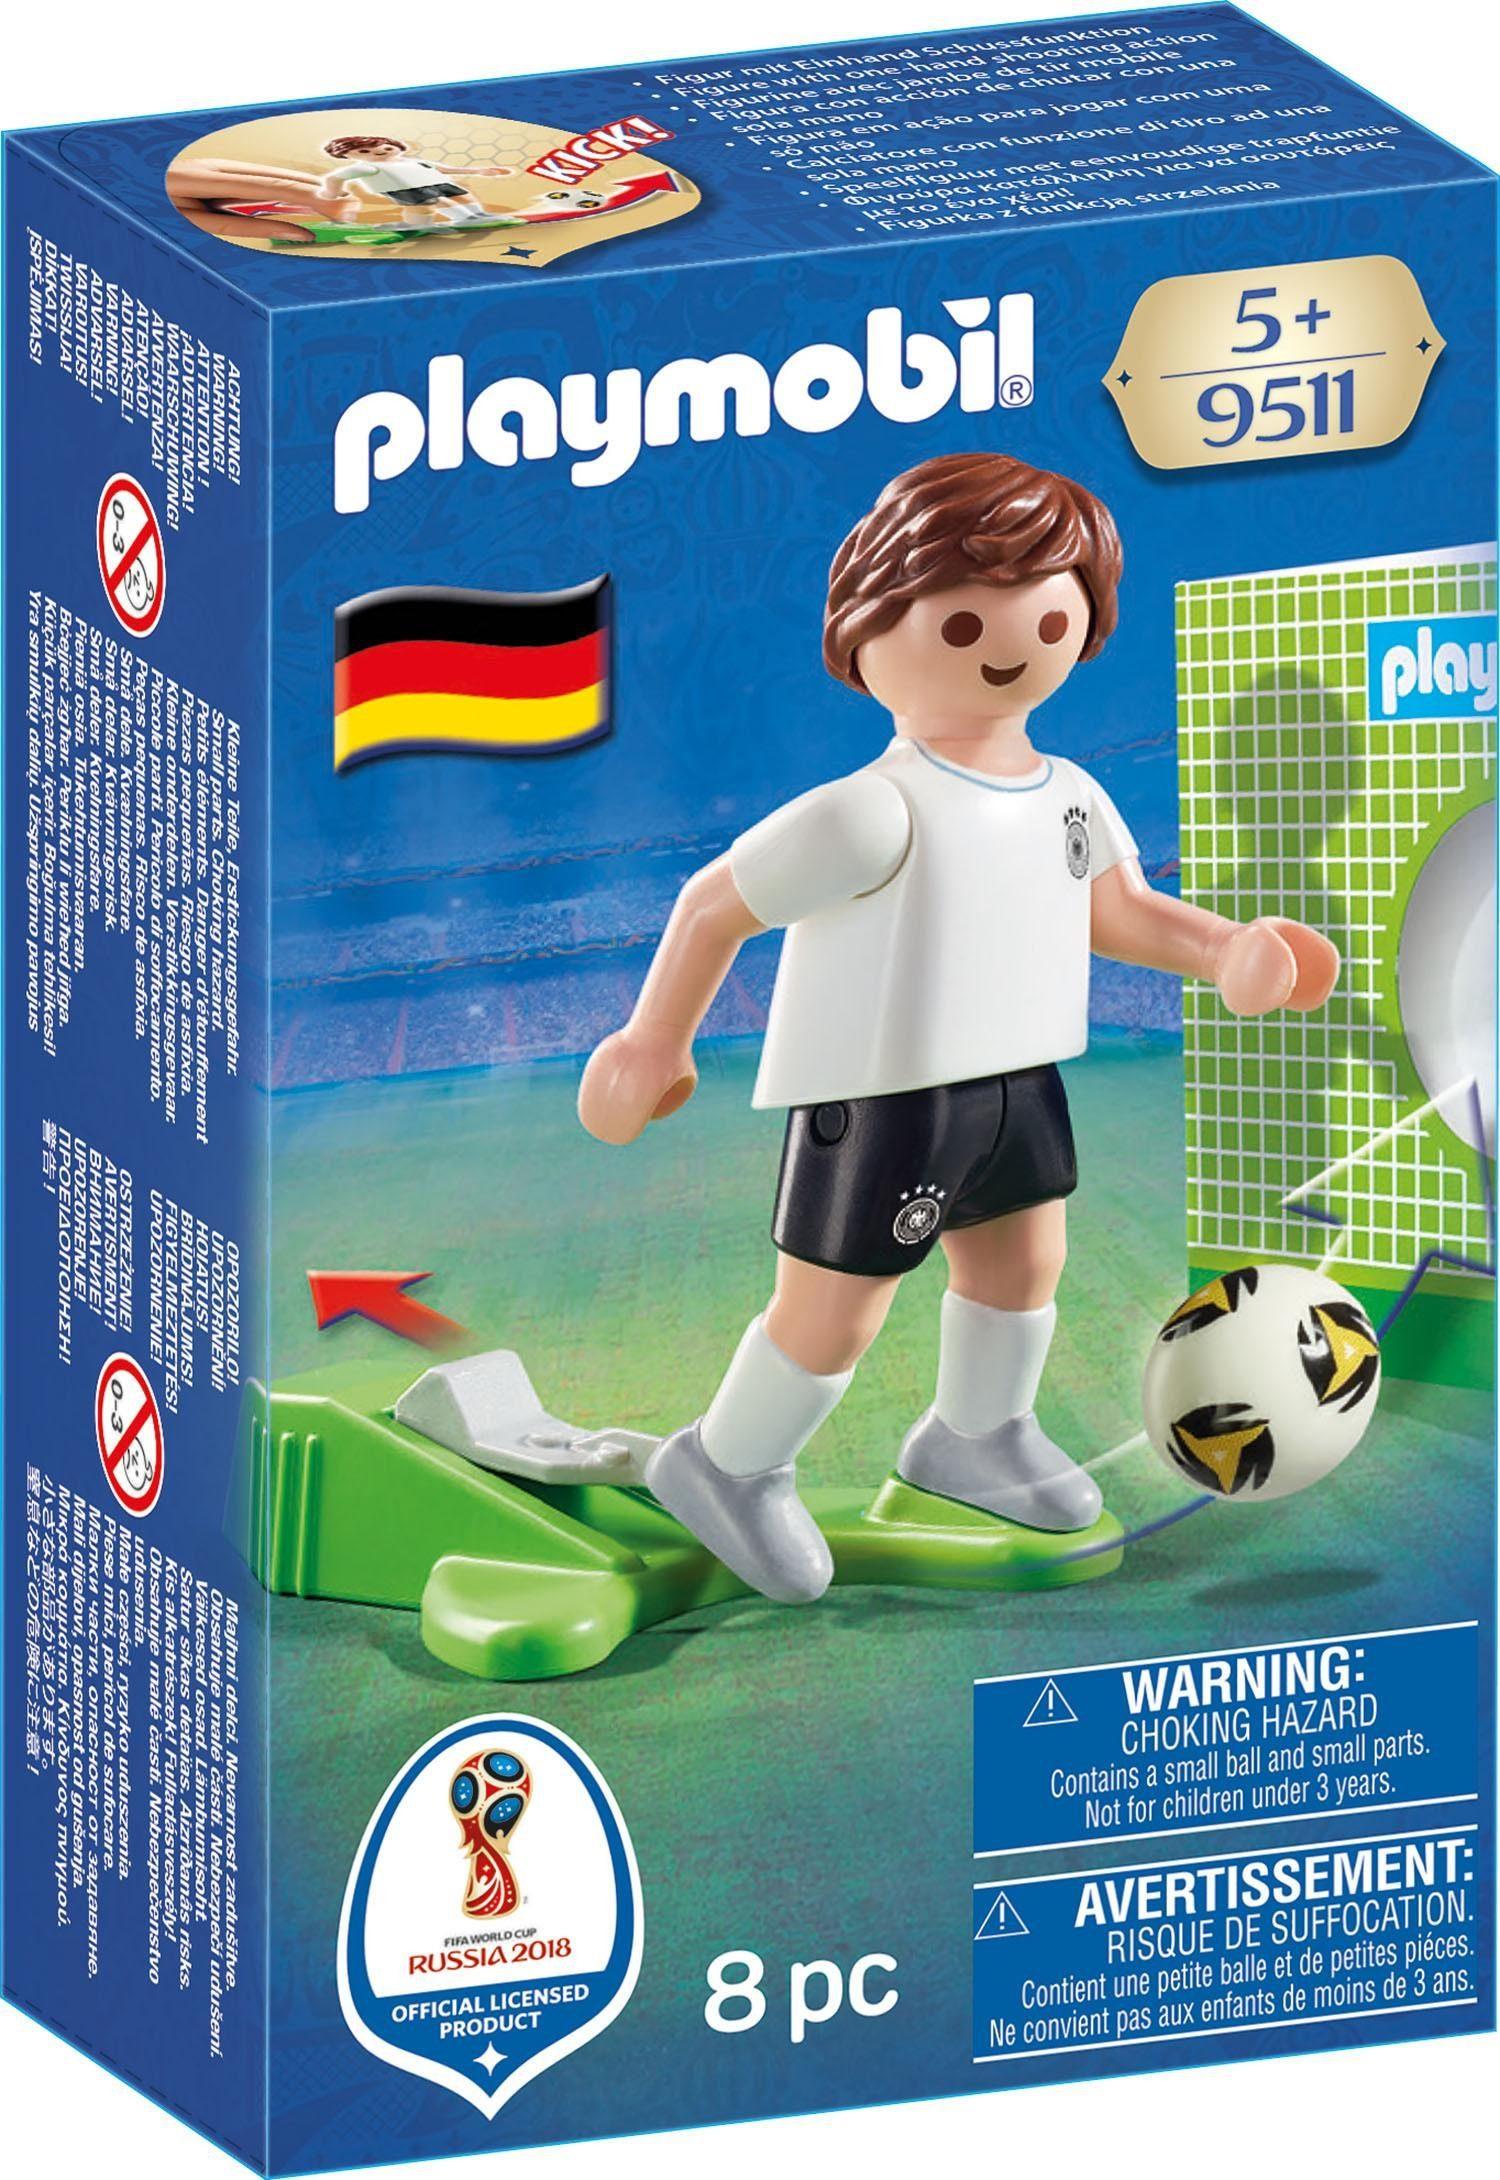 Playmobil® Nationalspieler Deutschland (9511), »Sports & Action - 2018 FIFA World Cup Russia™«